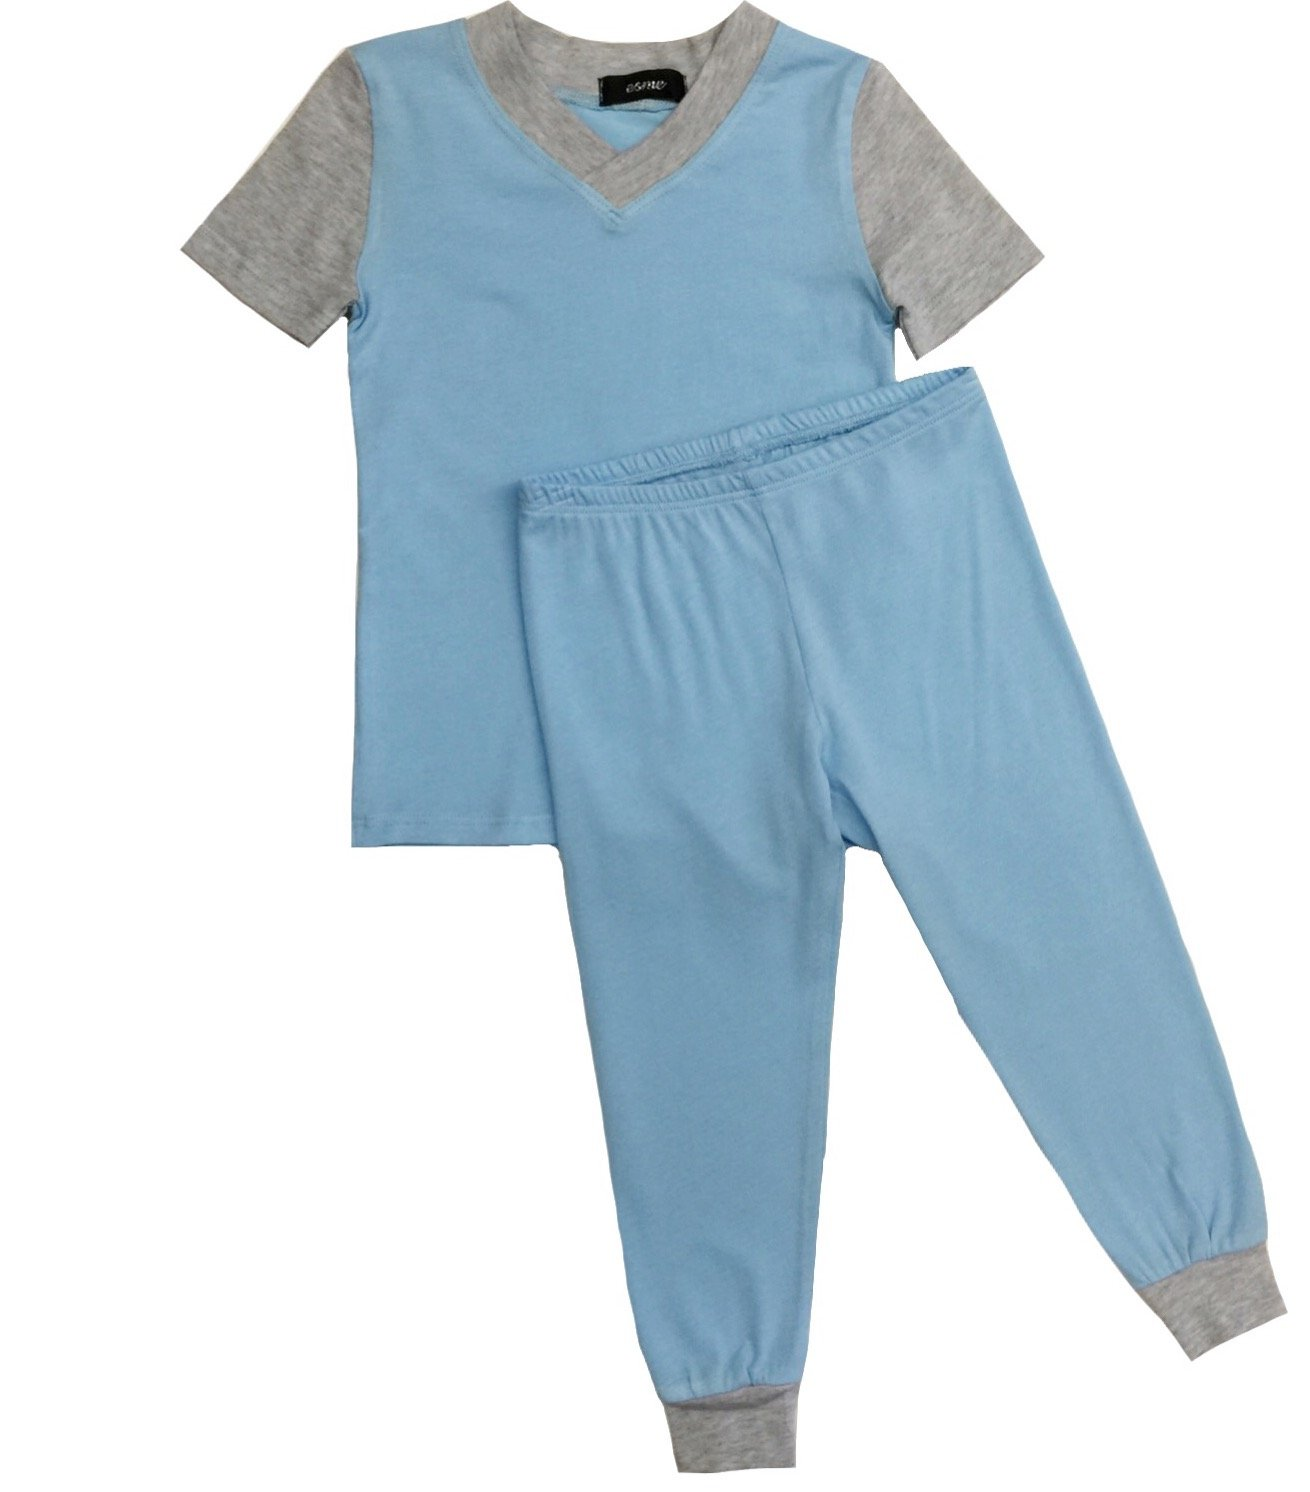 Esme Boys Pajamas Short Sleeve Top & Pant Set 8 Blue / Grey